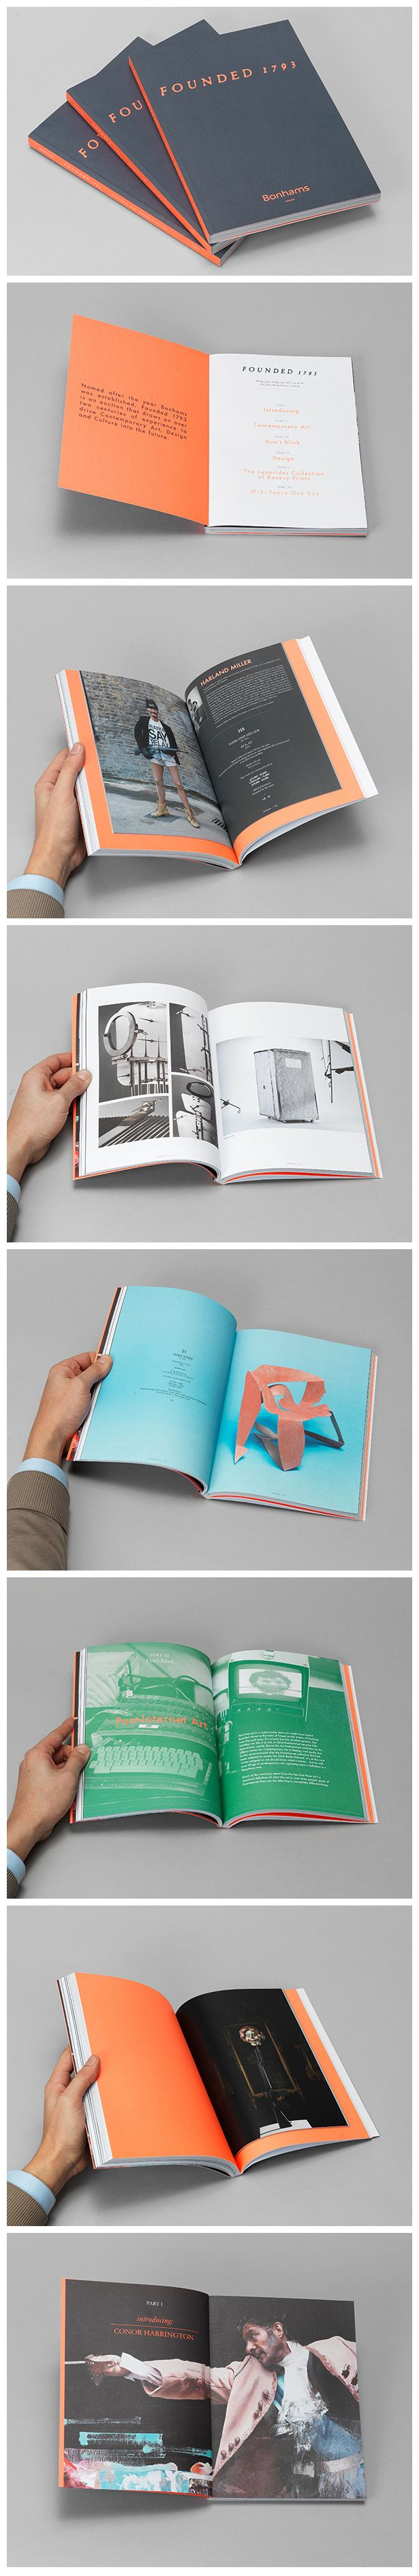 Bonhams explains the bright new designs innovations to its auction catalogue  http://www.itsnicethat.com/articles/bonhams-catalogue